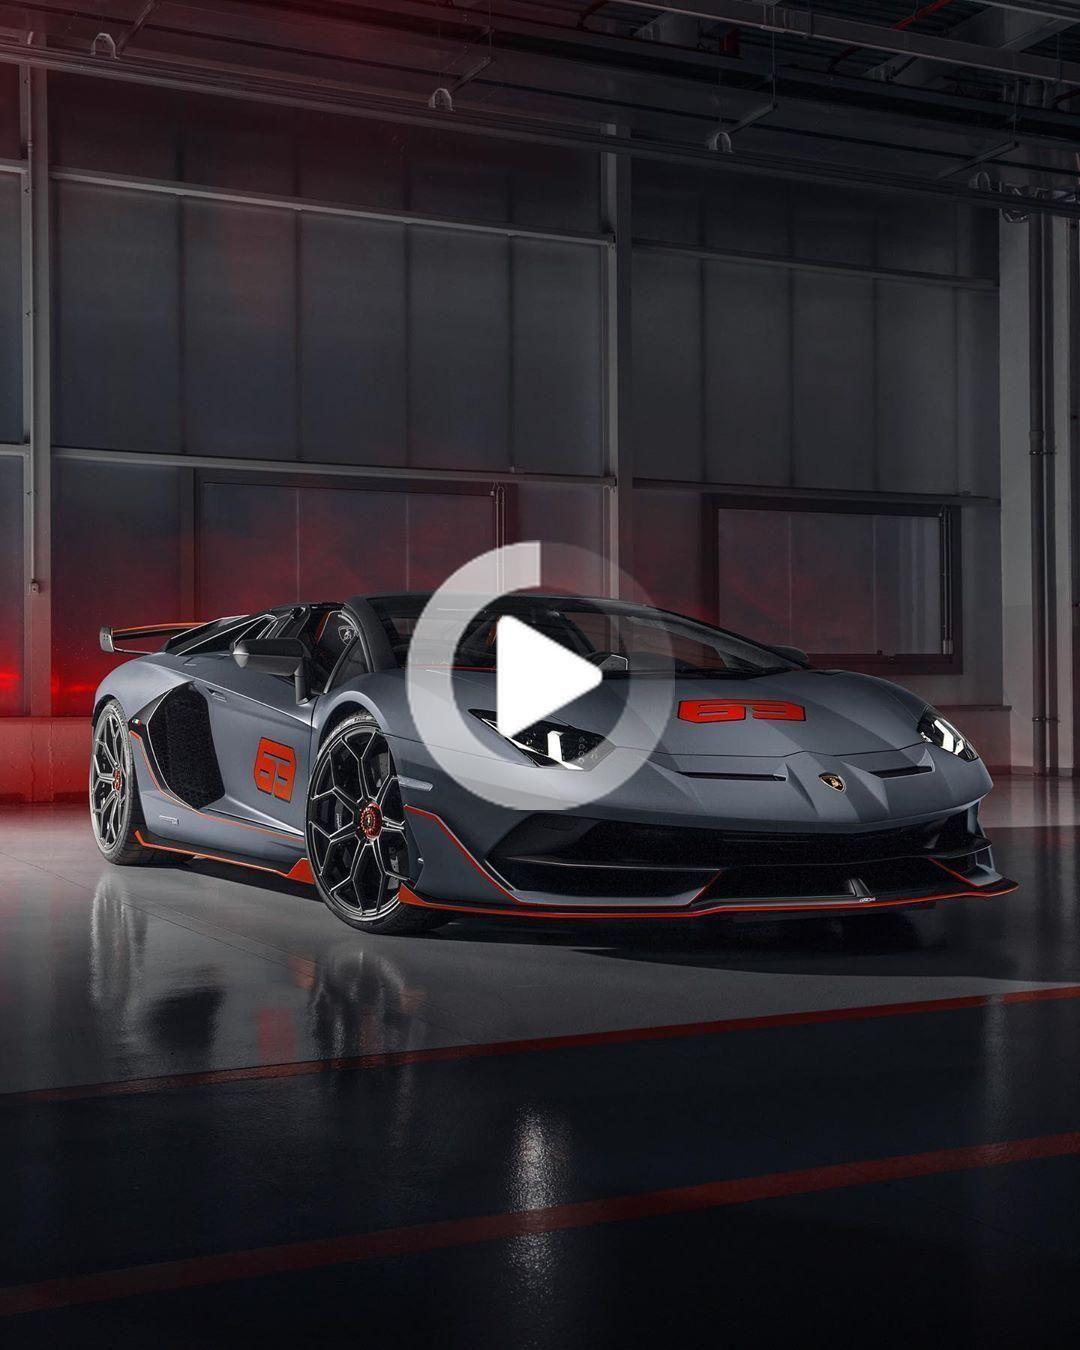 24 Trendy Luxury Cars Images In 2020 Luxury Car Photos Luxury Car Image Car Photos